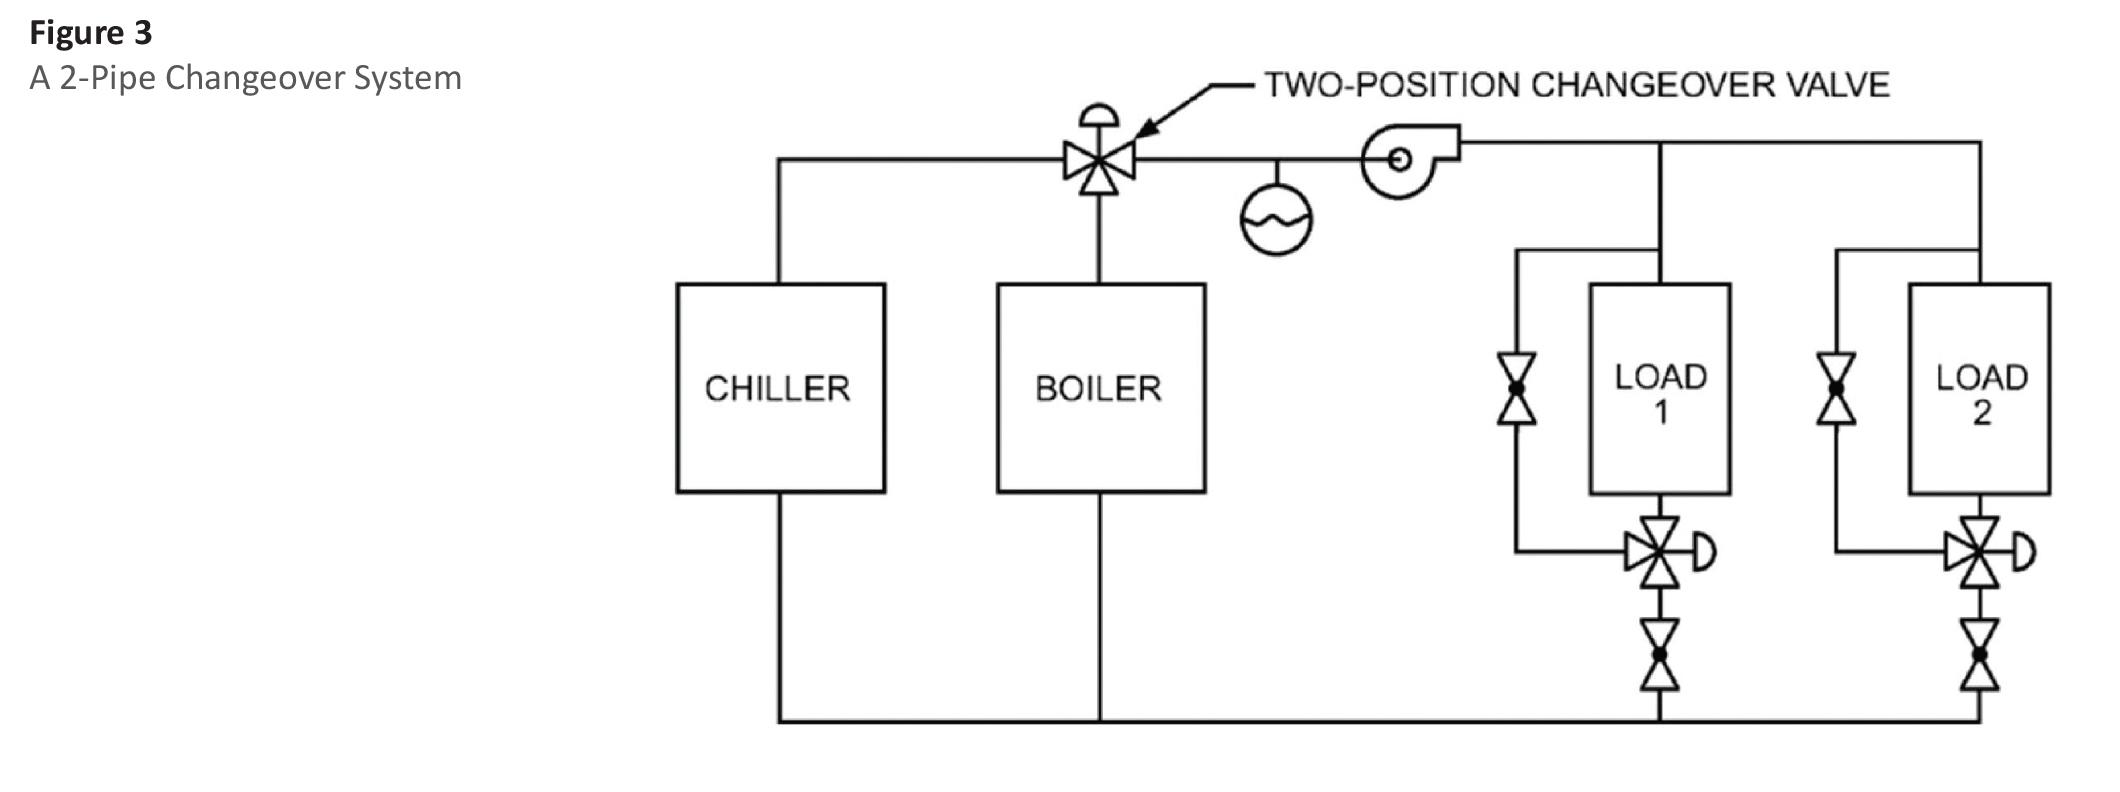 Vav Control Systems Diagrams